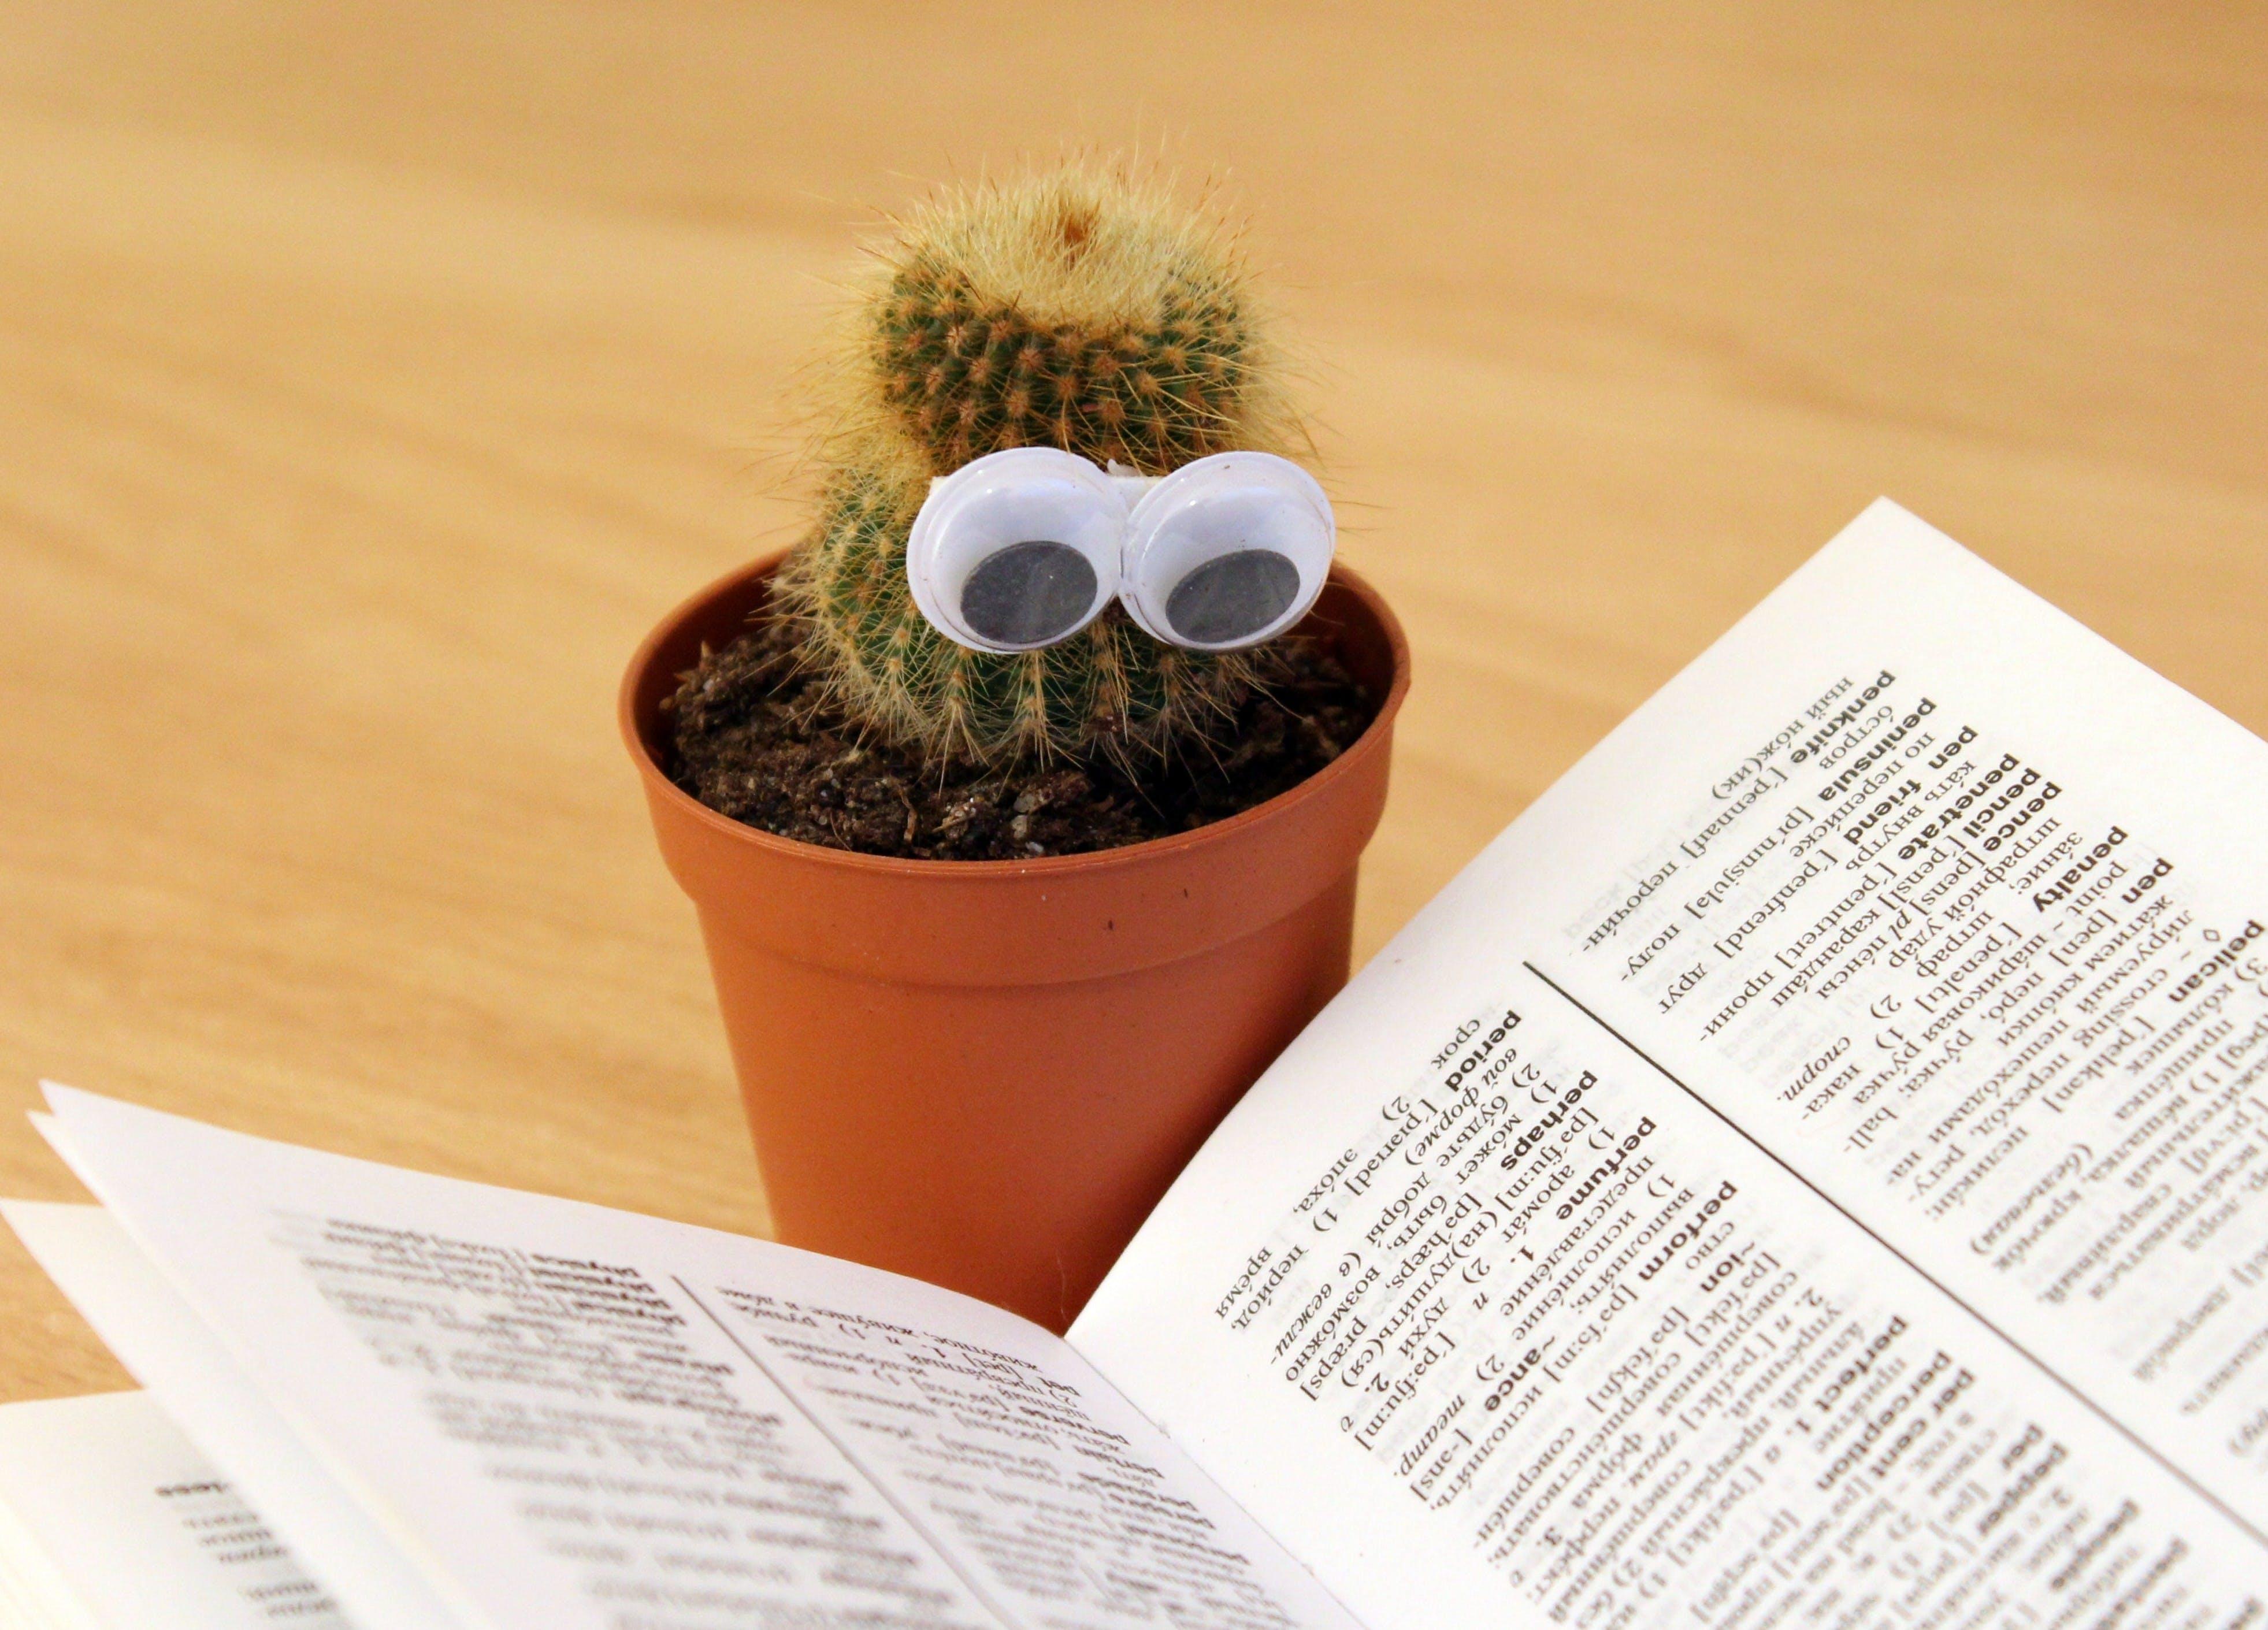 kaktus, kentnisse, seiten